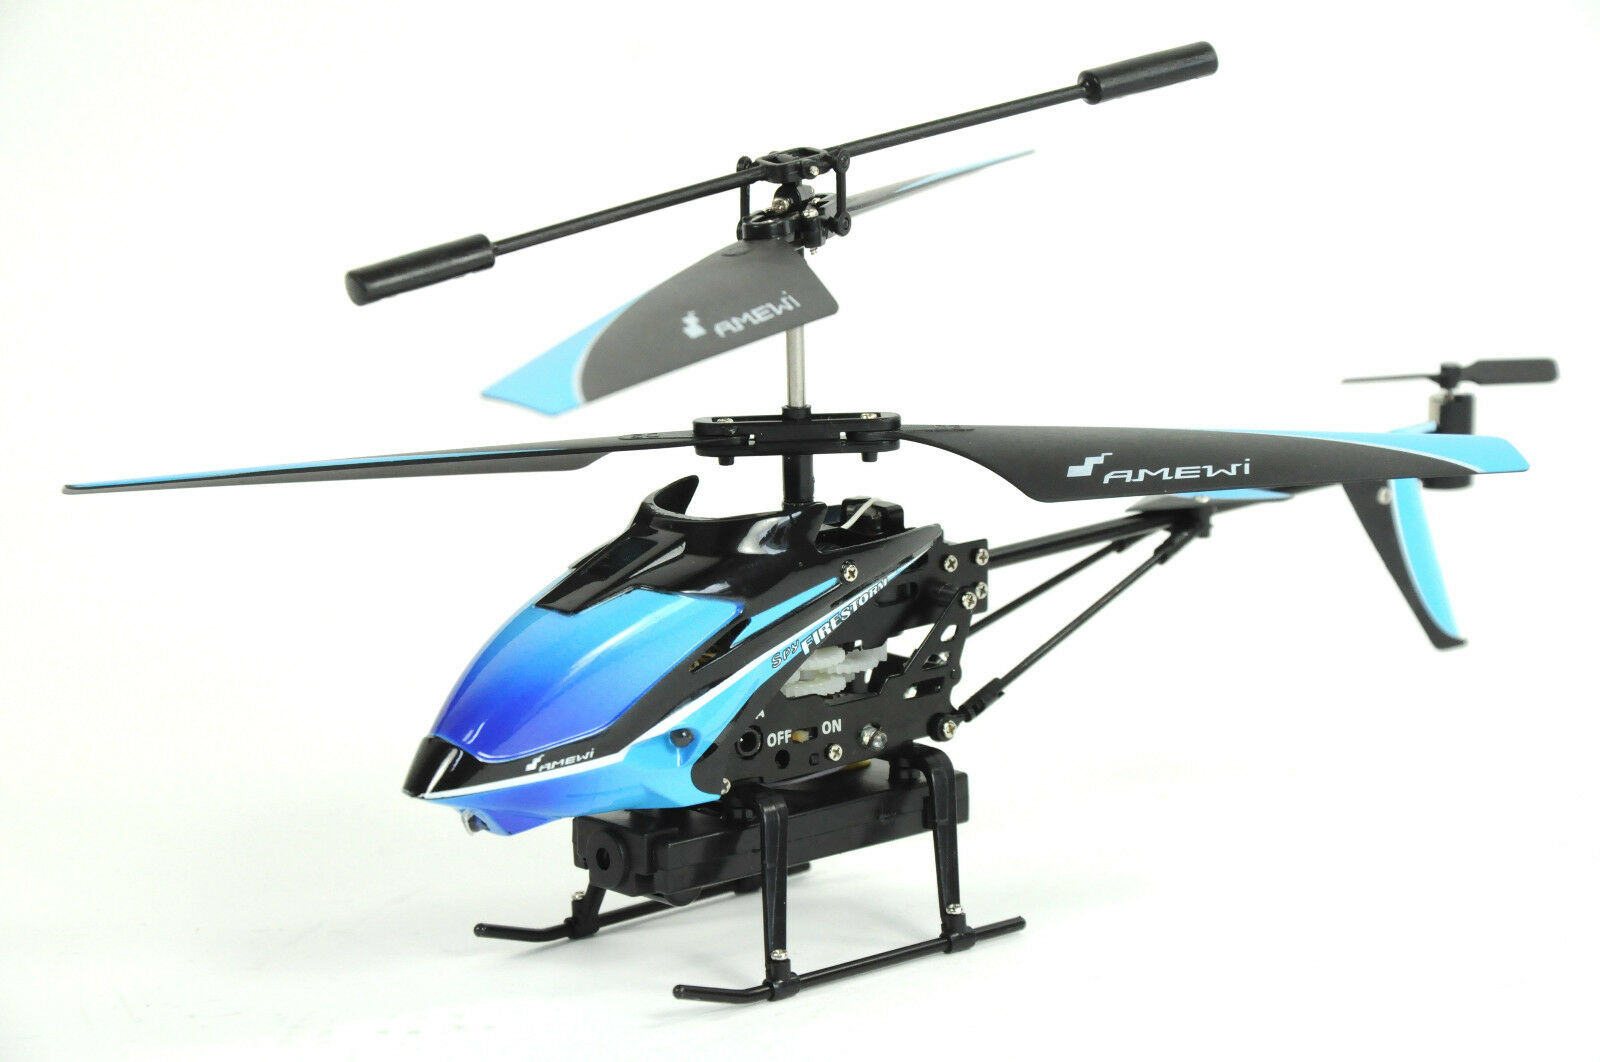 RC Helikopter Firestorm Spy mit Videokamera IR / 3 Kanal / RTF / Micro SD/ 512MB